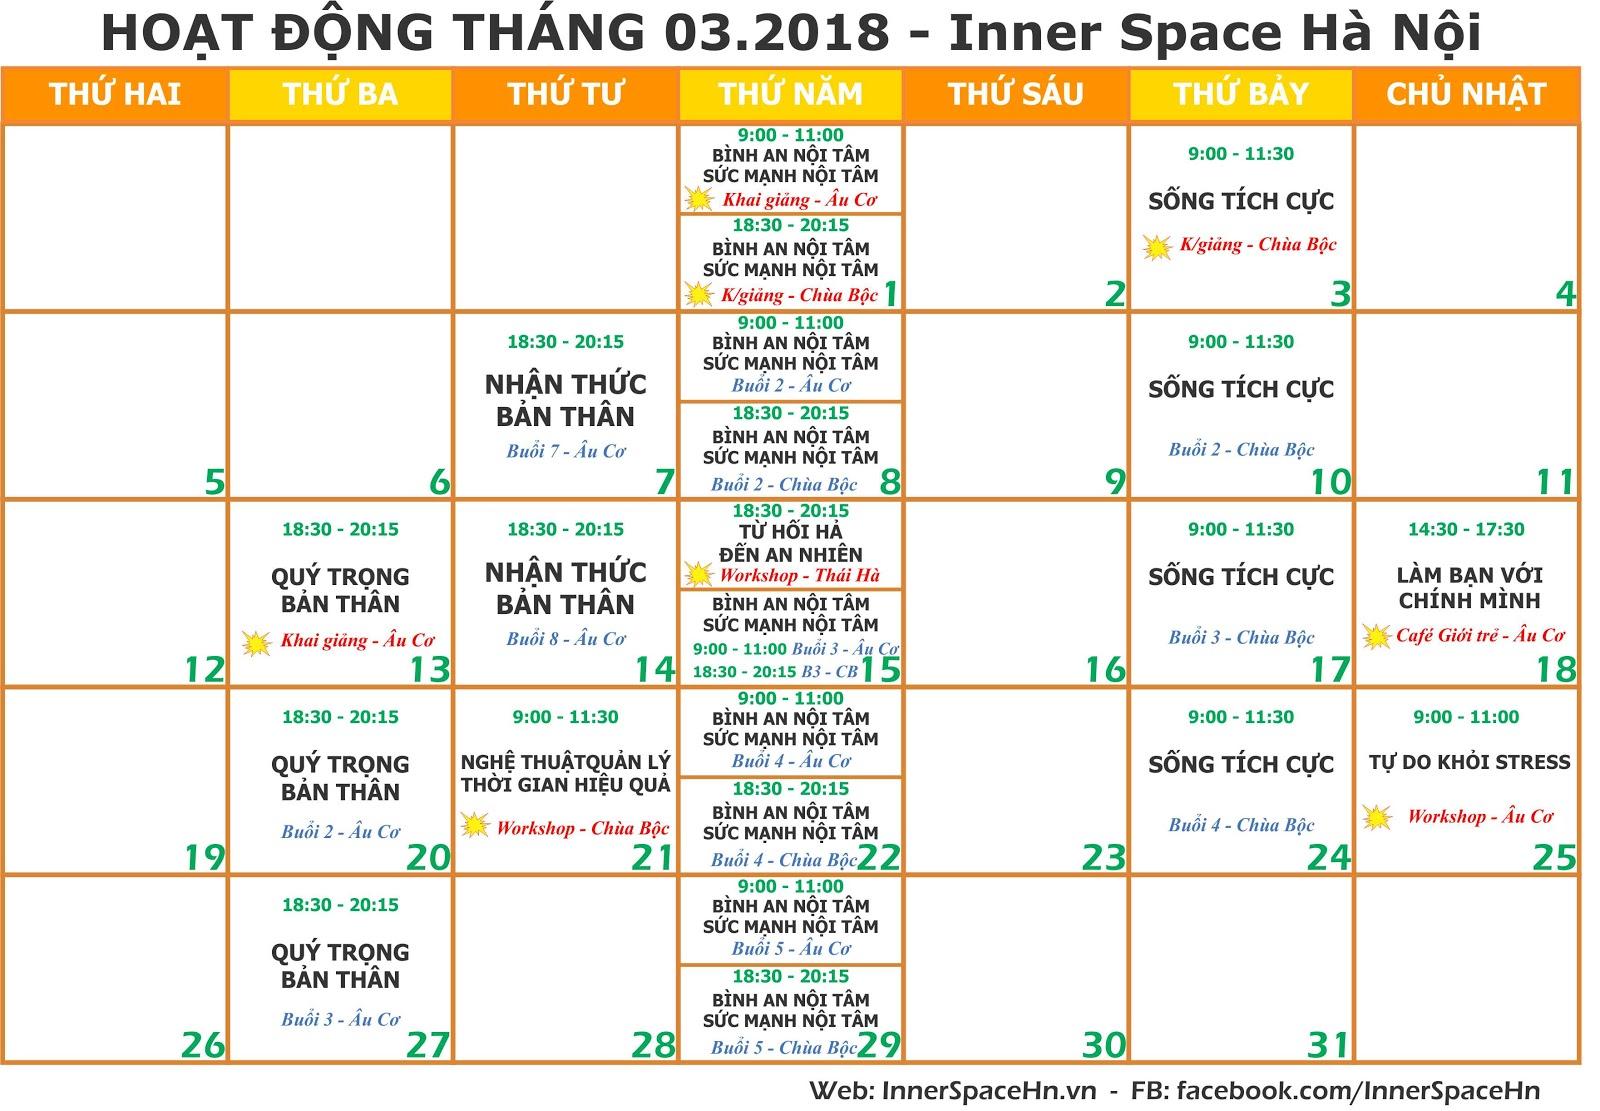 Trung-tam-Inner-Space-Lam-giau-the-gioi-noi-tam